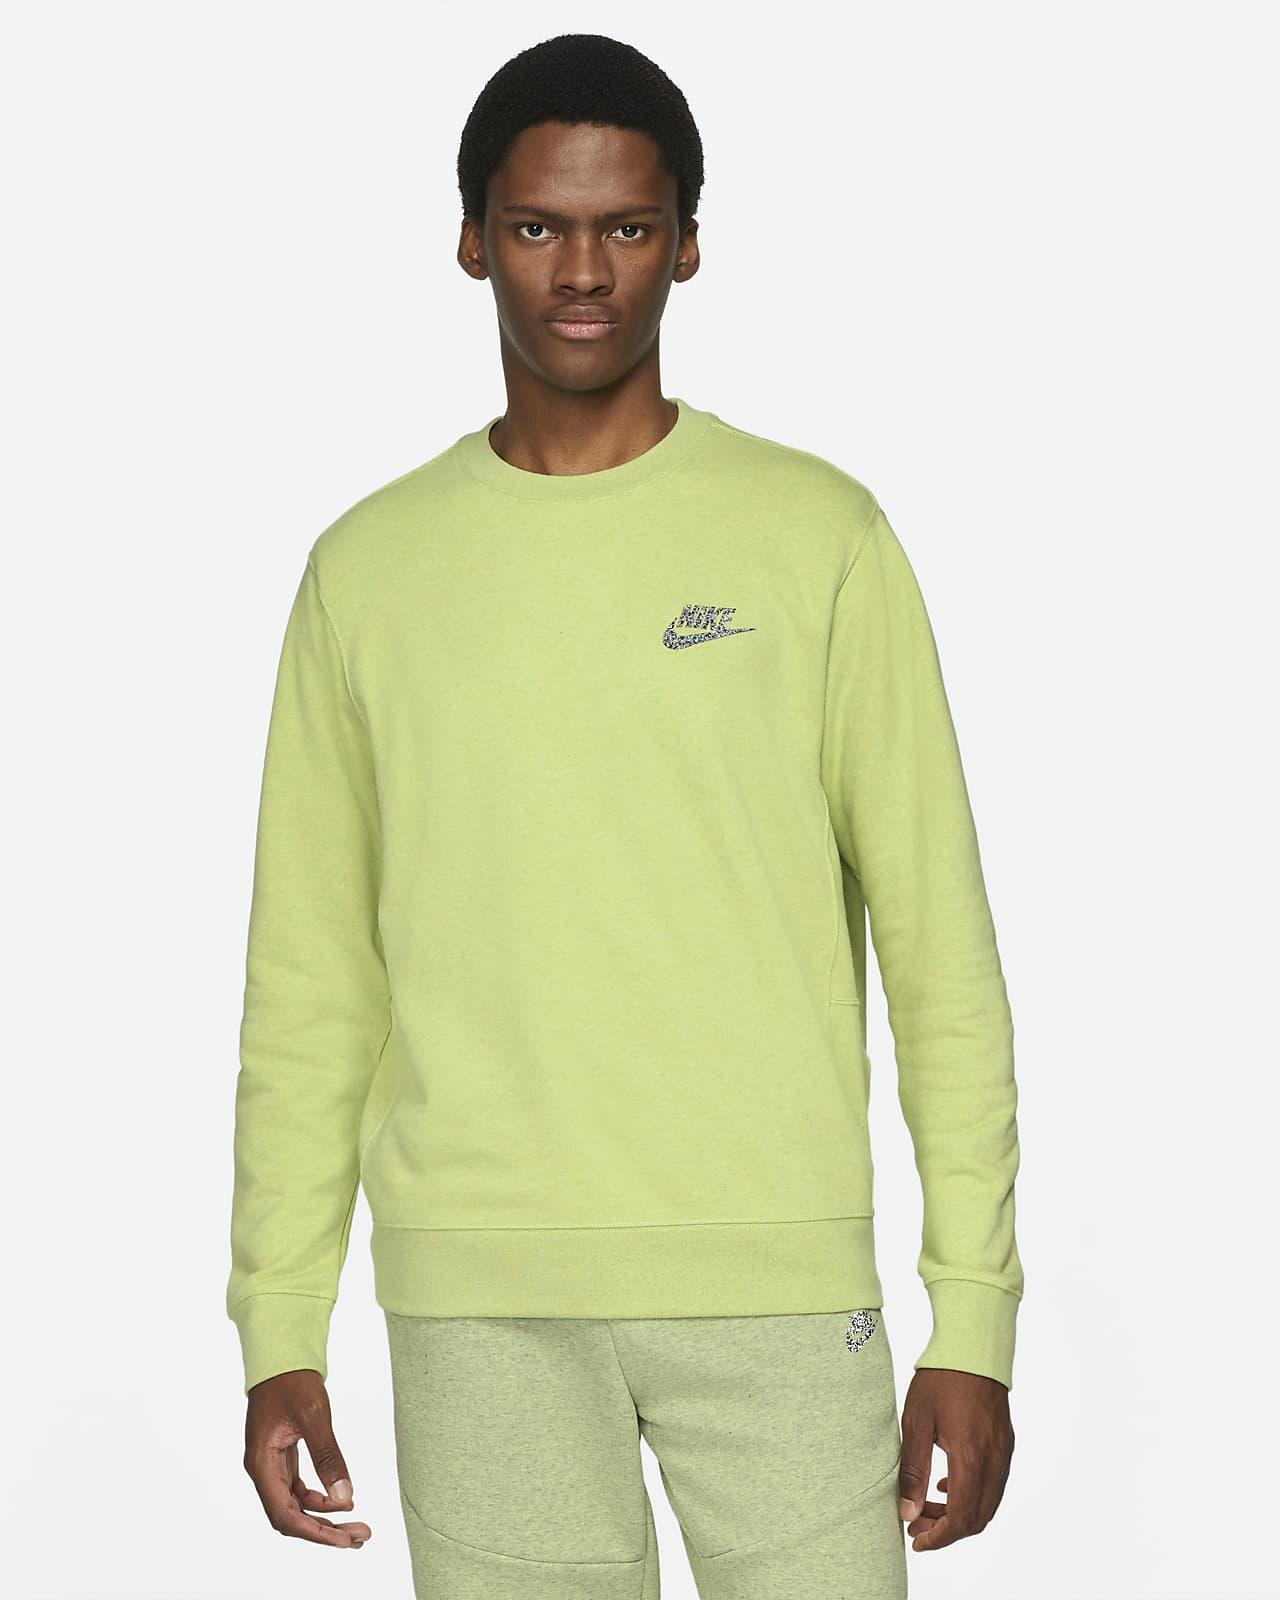 Мужская толстовка с полуначесом Nike Sportswear Sport Essentials+